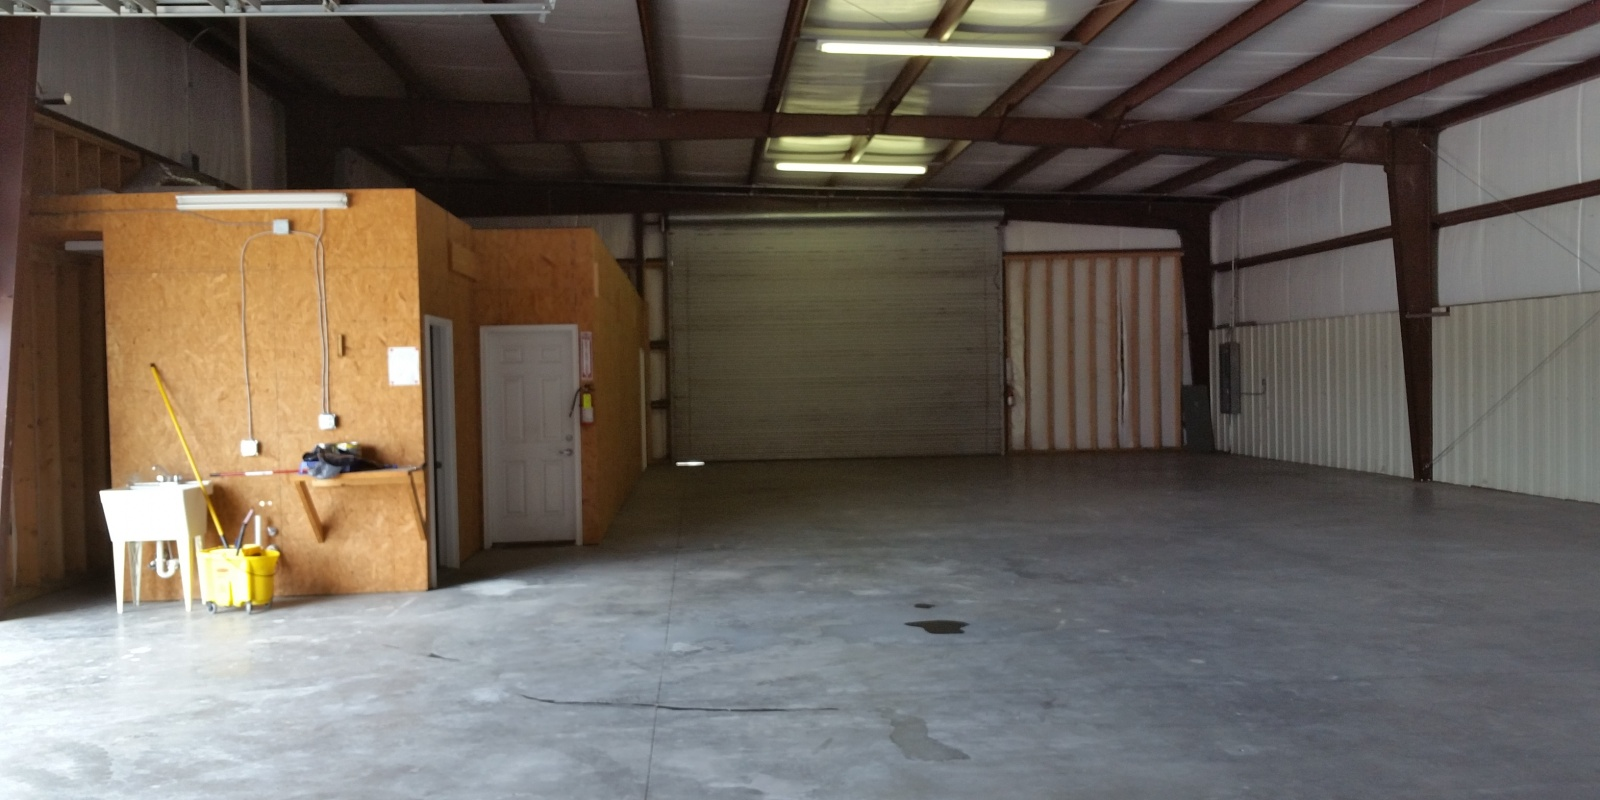 Lot 3 Thompson Road,Longs,South Carolina,29568,Industrial / Flex,Thompson Road,1331